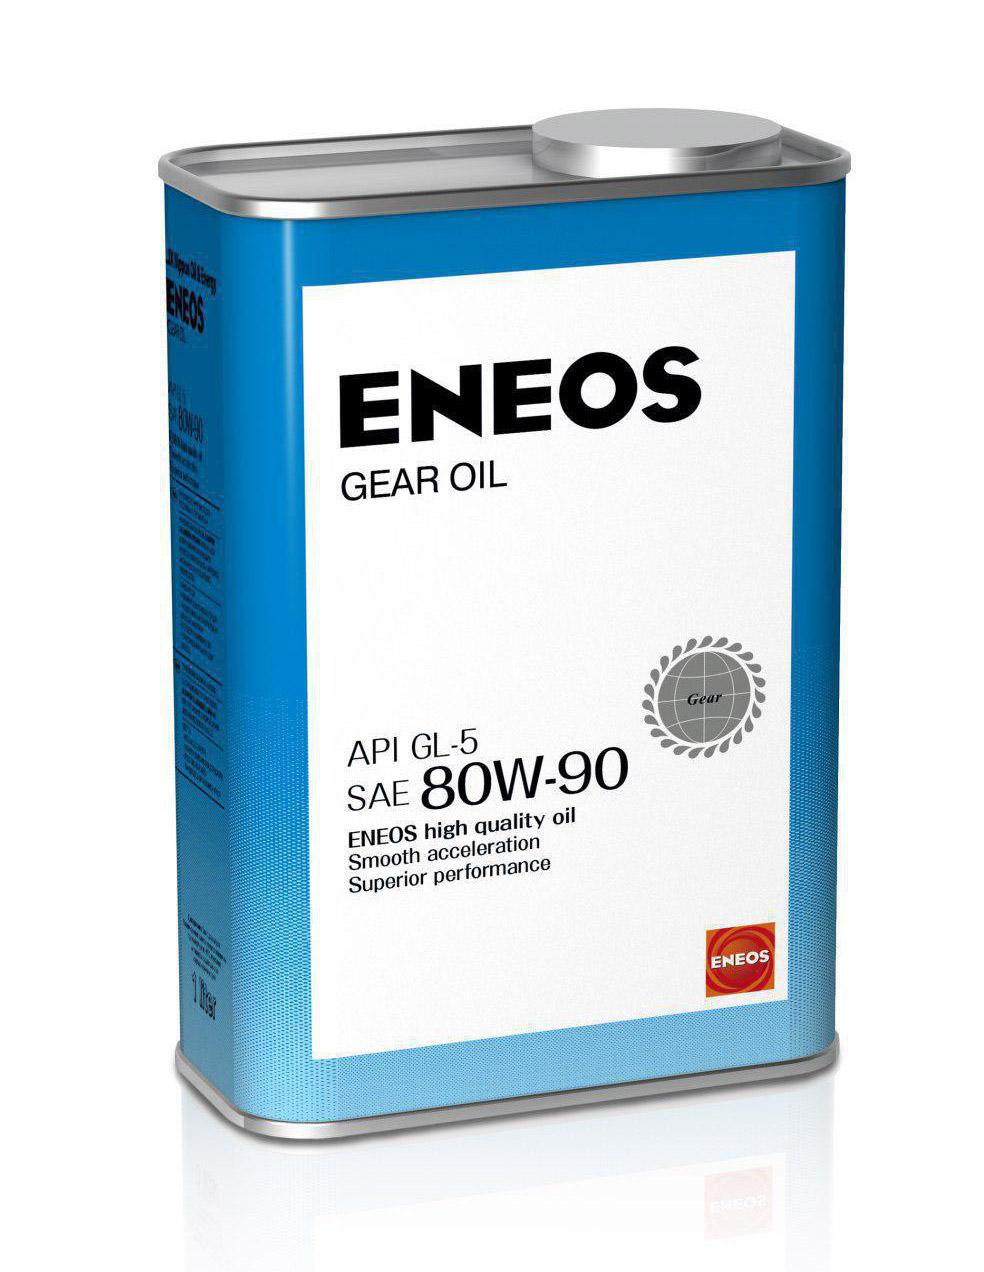 ЕNEOS GEAR, 75w-90, GL-4, трансмиссионное масло, полусинтетика, 1л, Япония